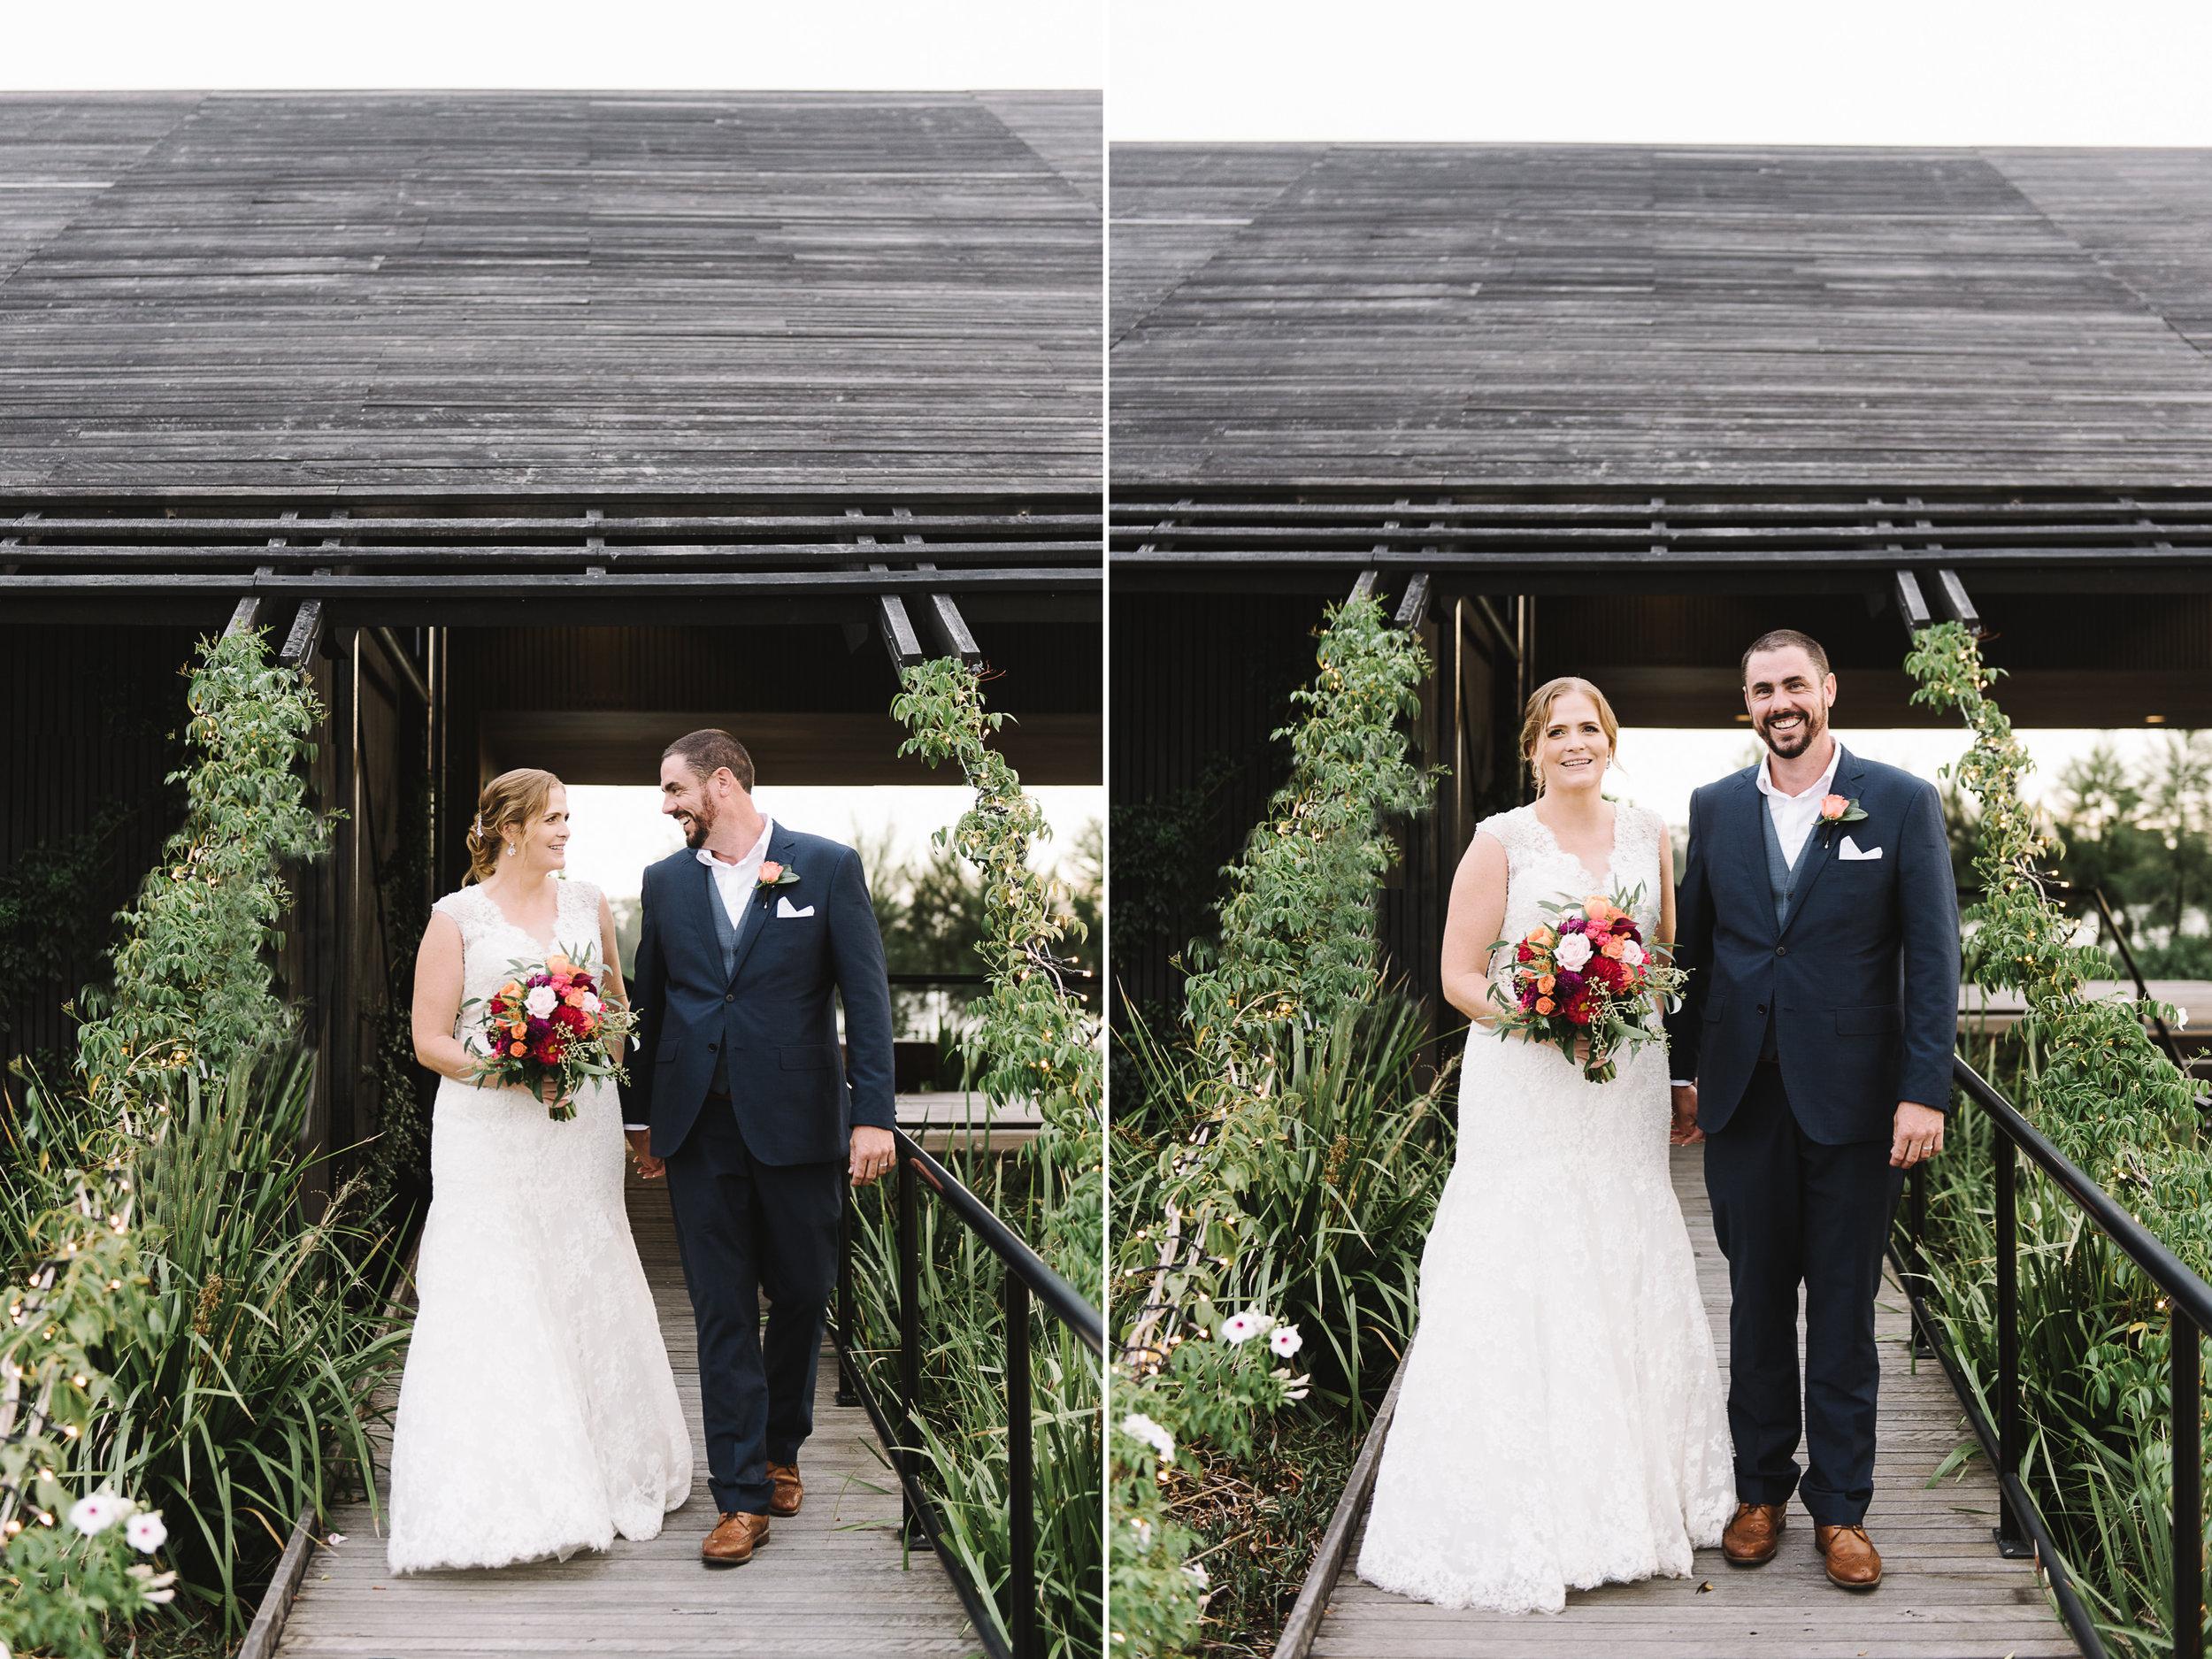 Northshore-Brisbane-Wedding-1.jpg